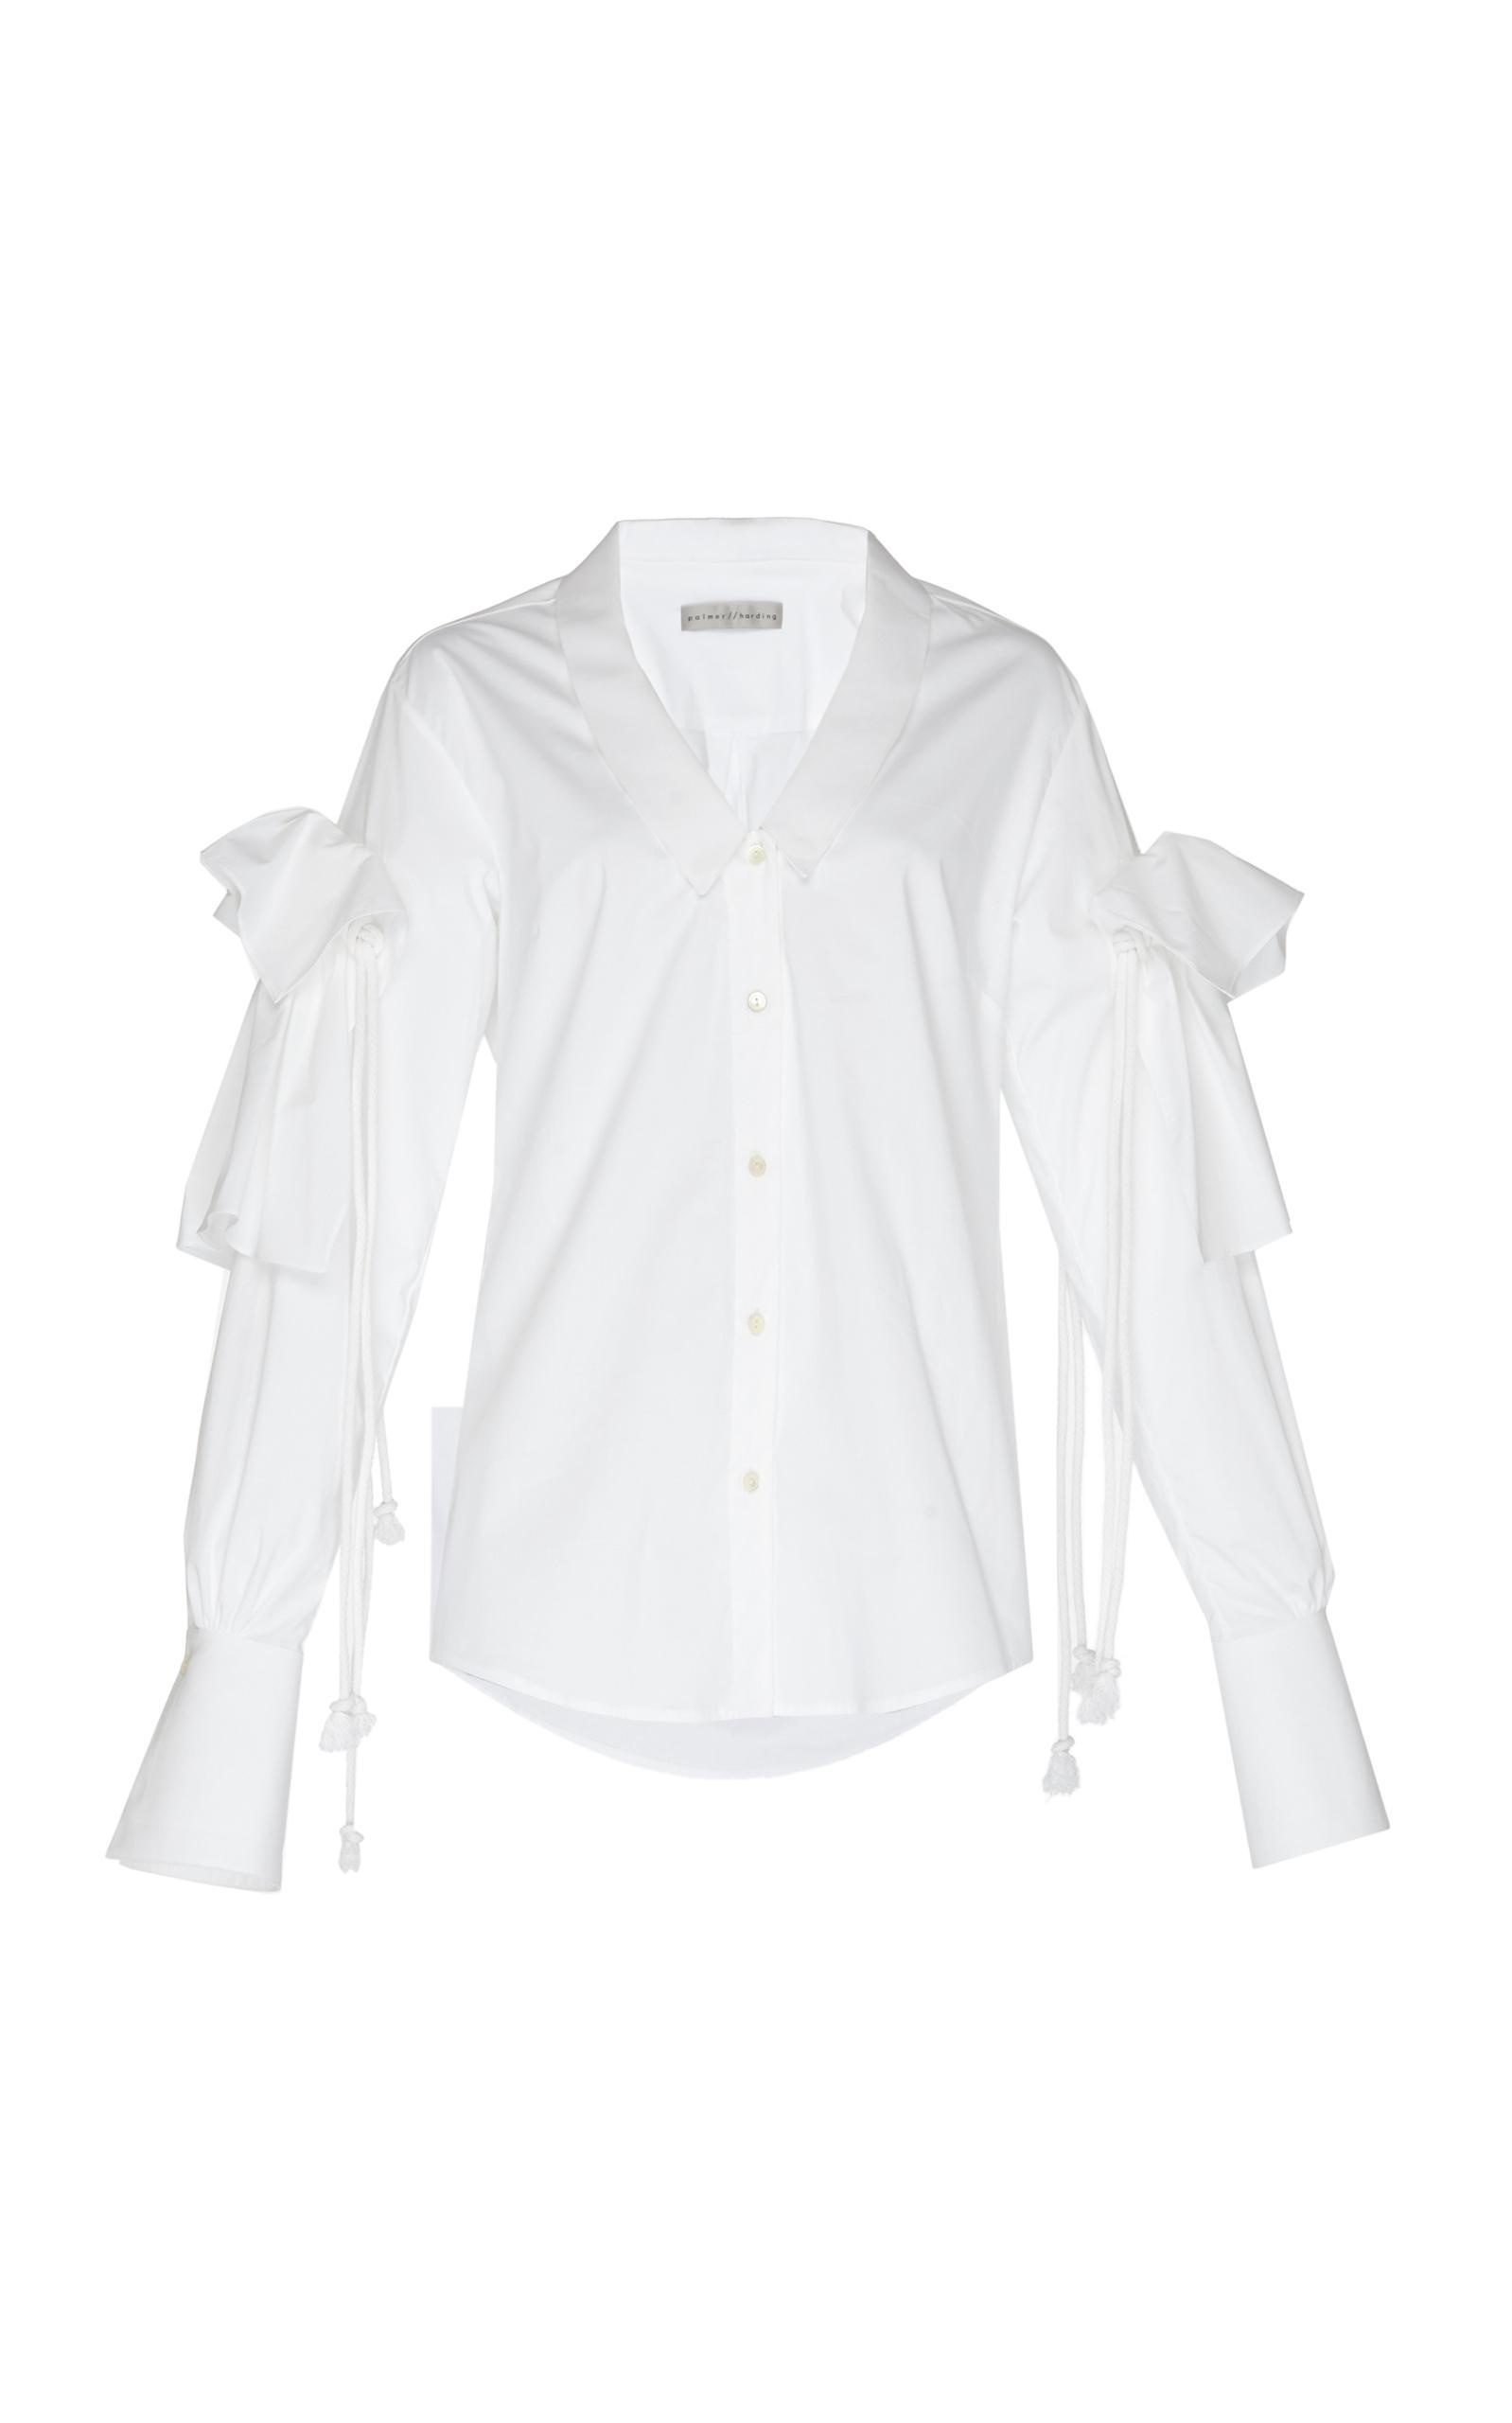 Lyst palmer harding combine v neck button up shirt in white for V neck button up shirt